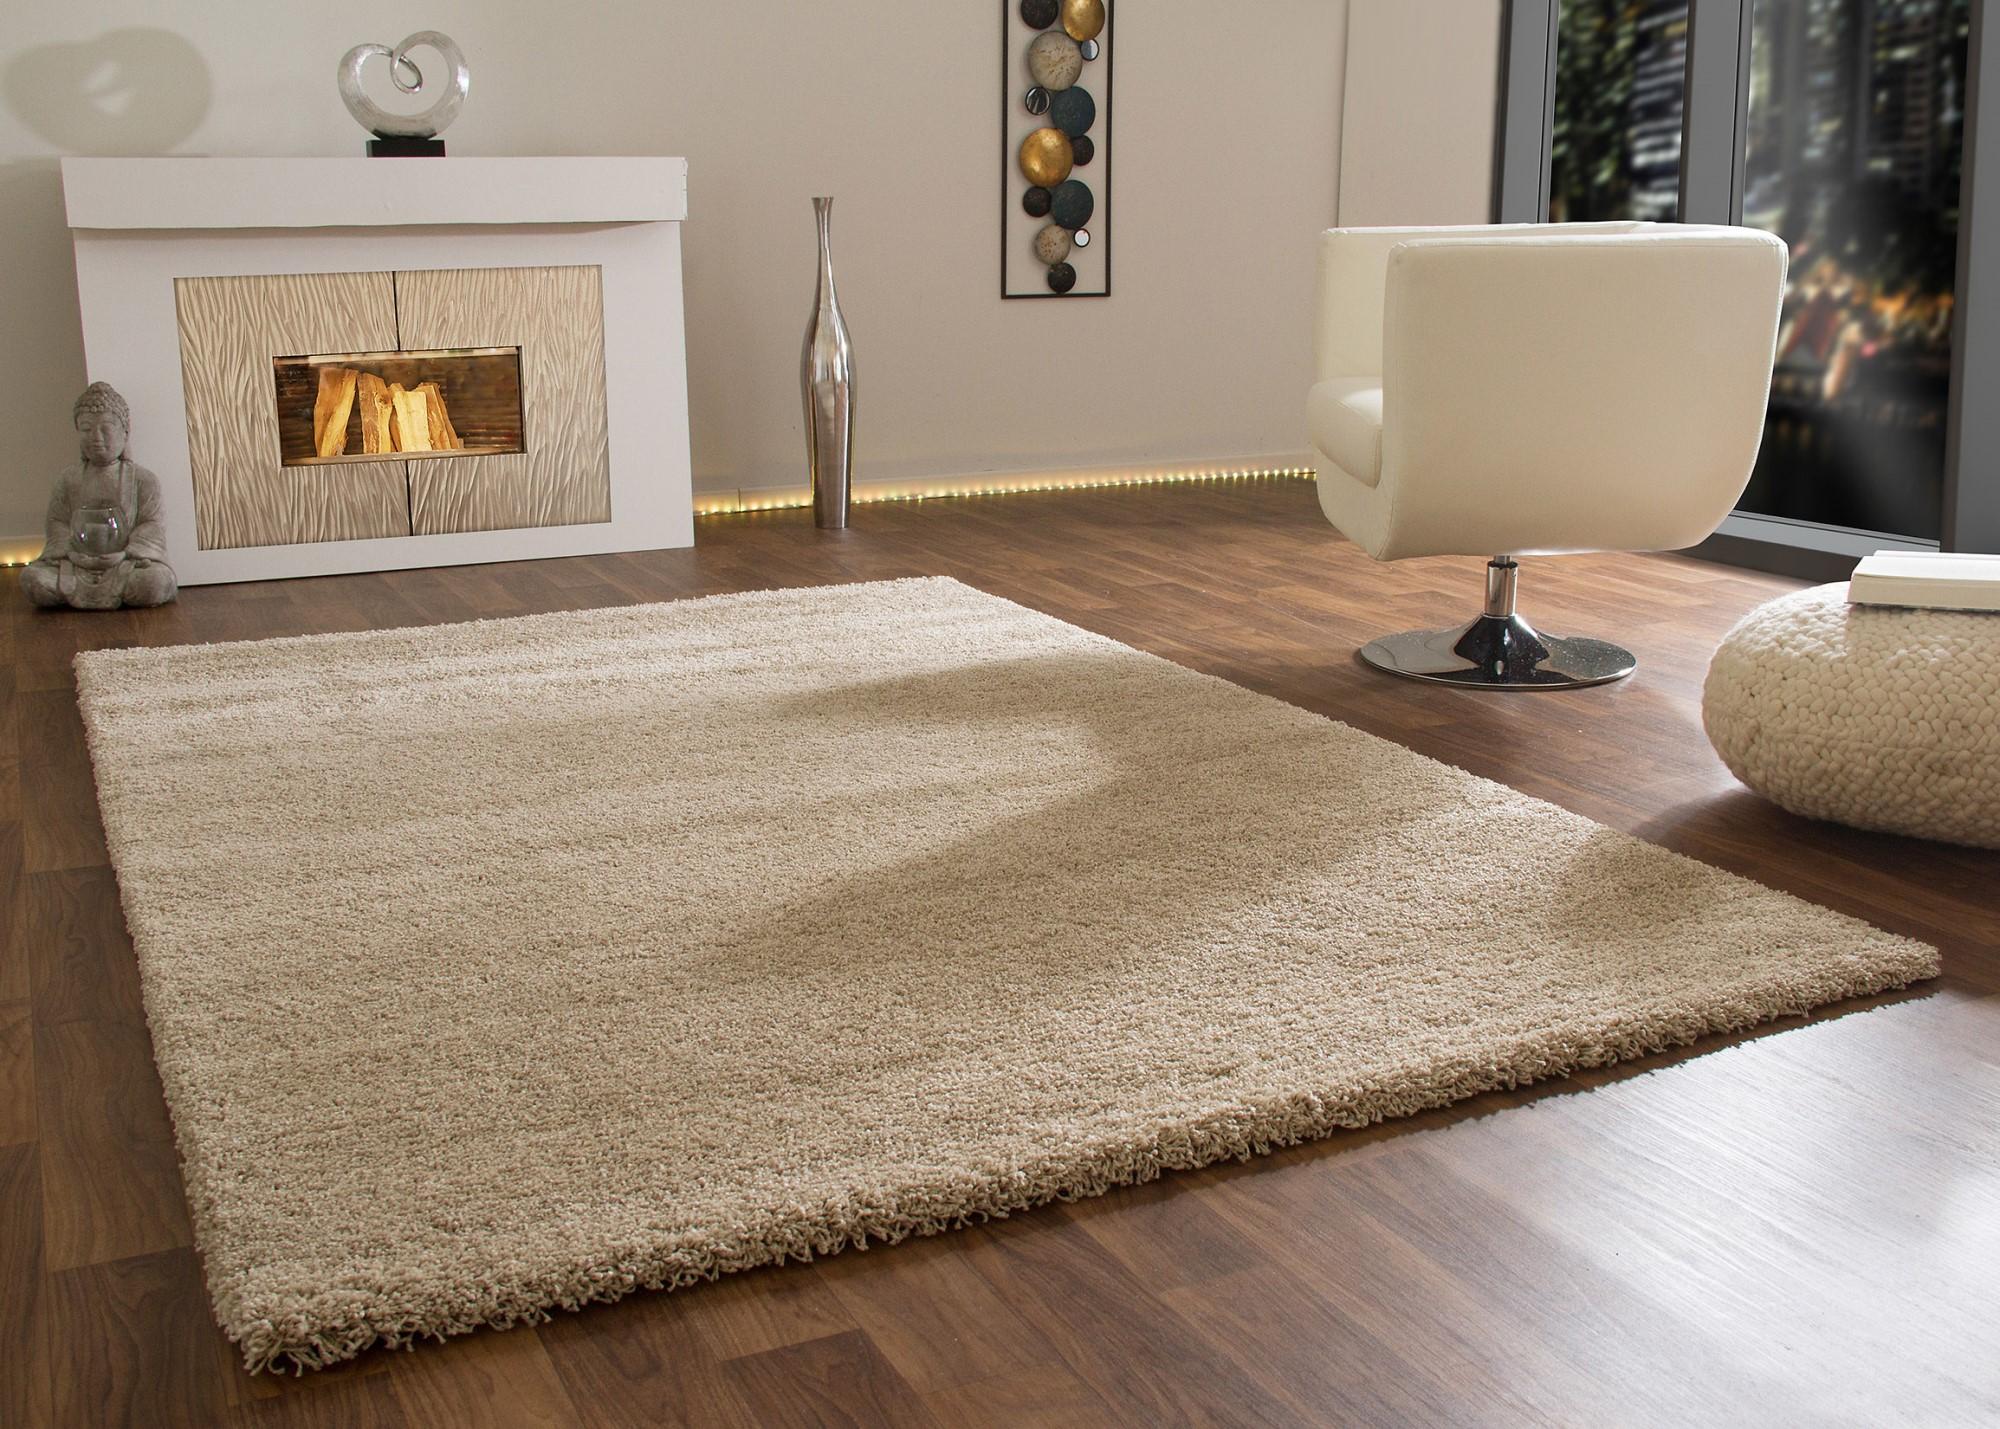 langflor hochflor teppich chamonix shaggy creme beige grau. Black Bedroom Furniture Sets. Home Design Ideas